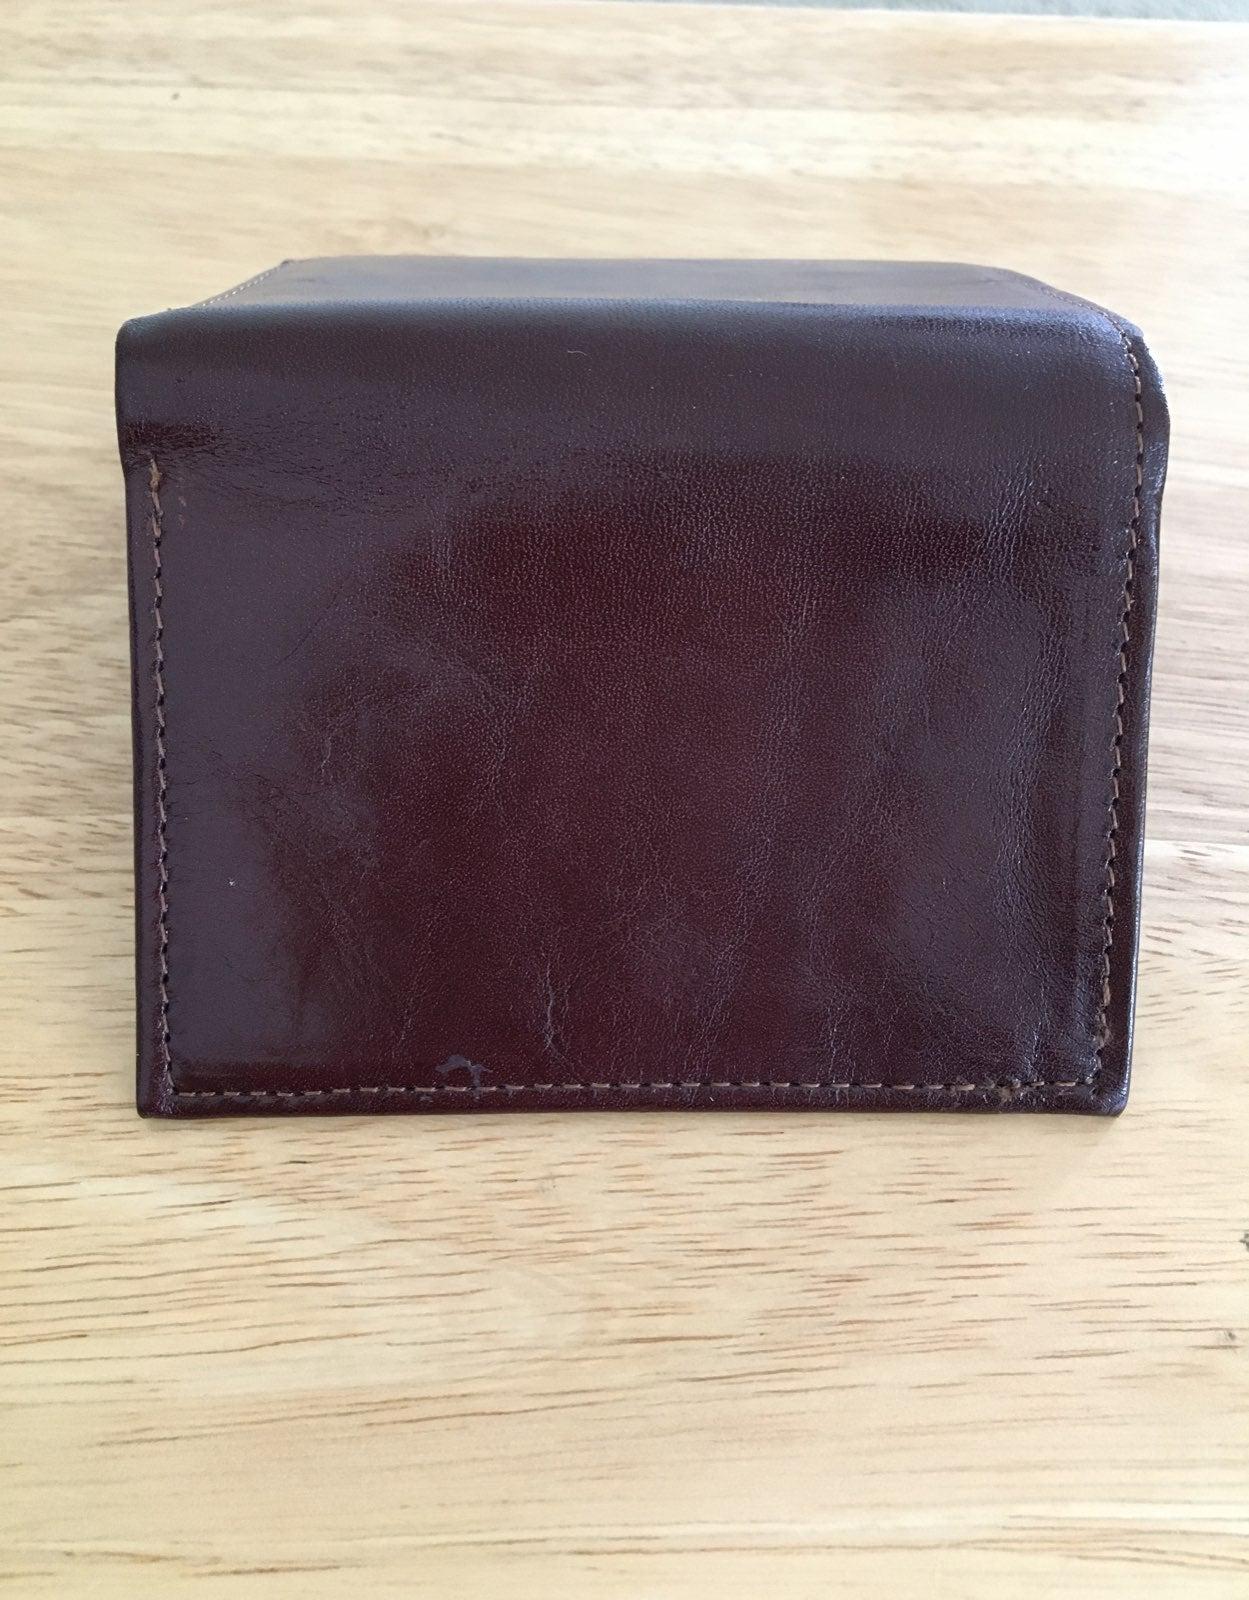 George Leather Wallet Italian Leather NE